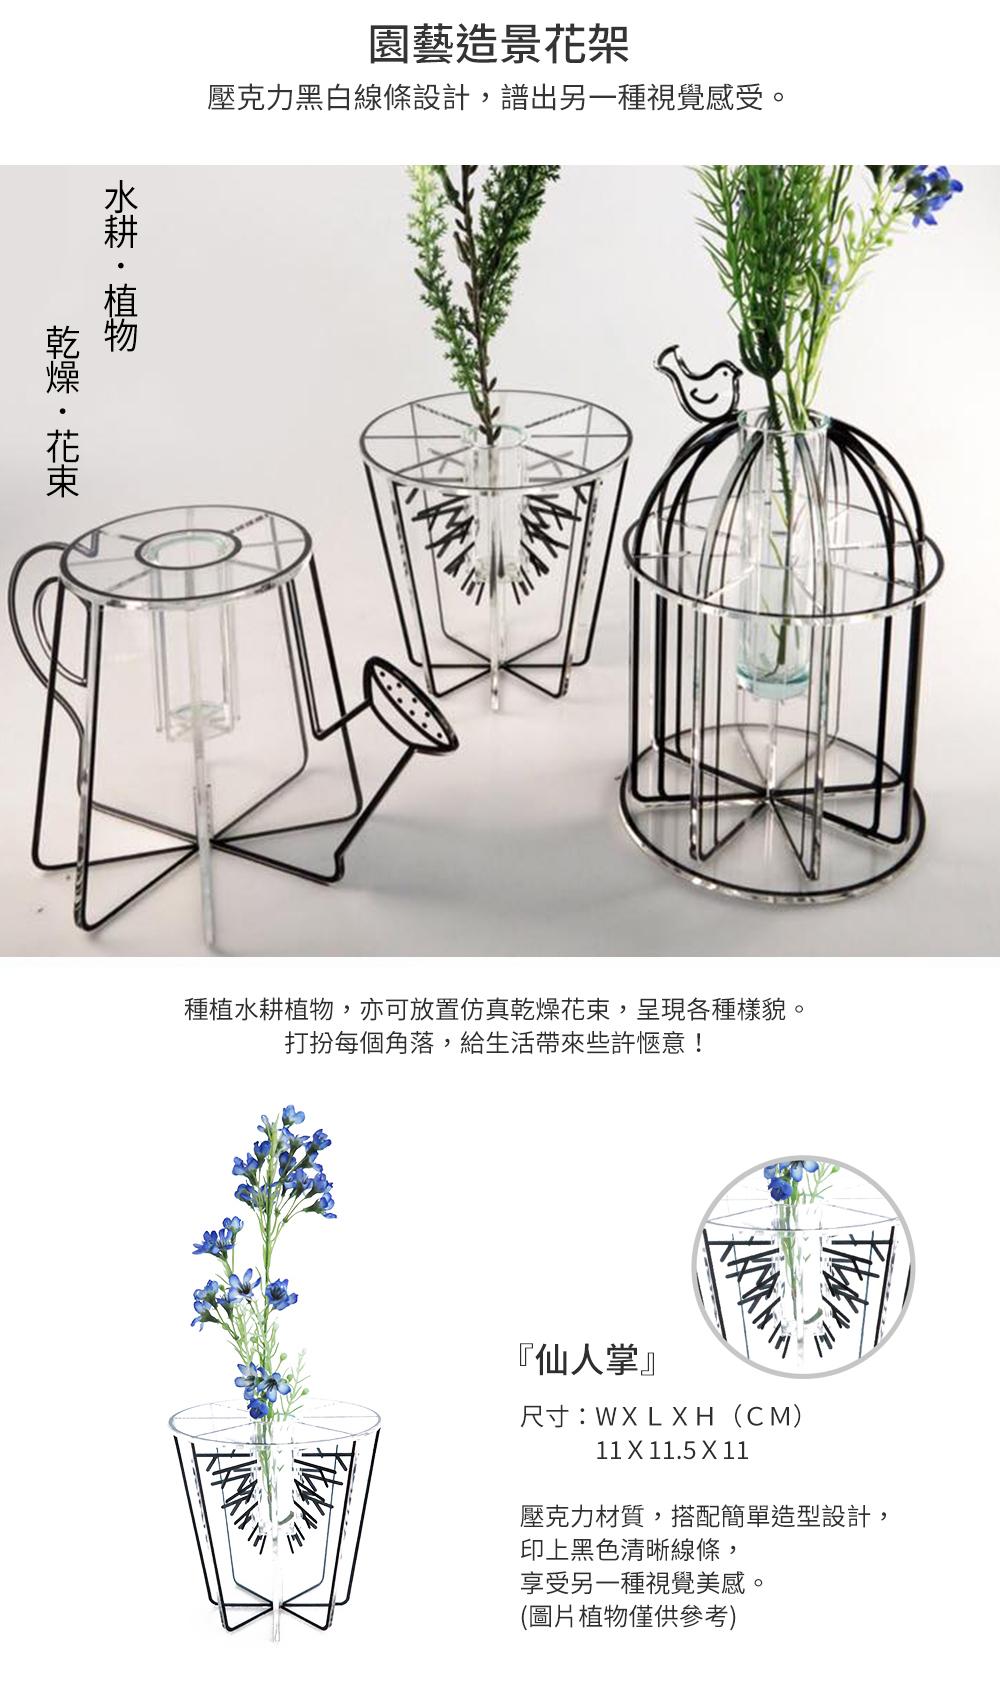 GreenPandora 園藝造景花架(不含植物)(仙人掌)